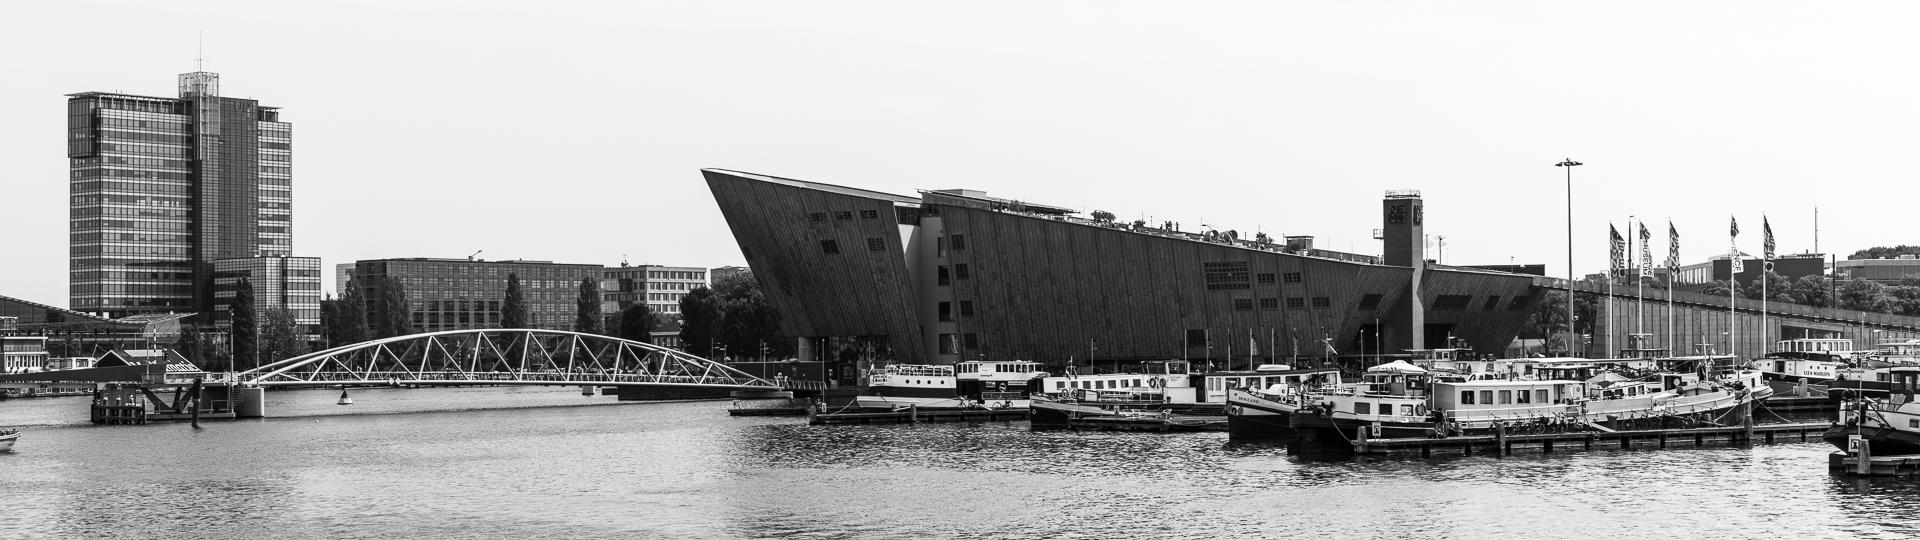 NEMO Science Museum / Renzo Piano Building Workshop (1997) - Amsterdam